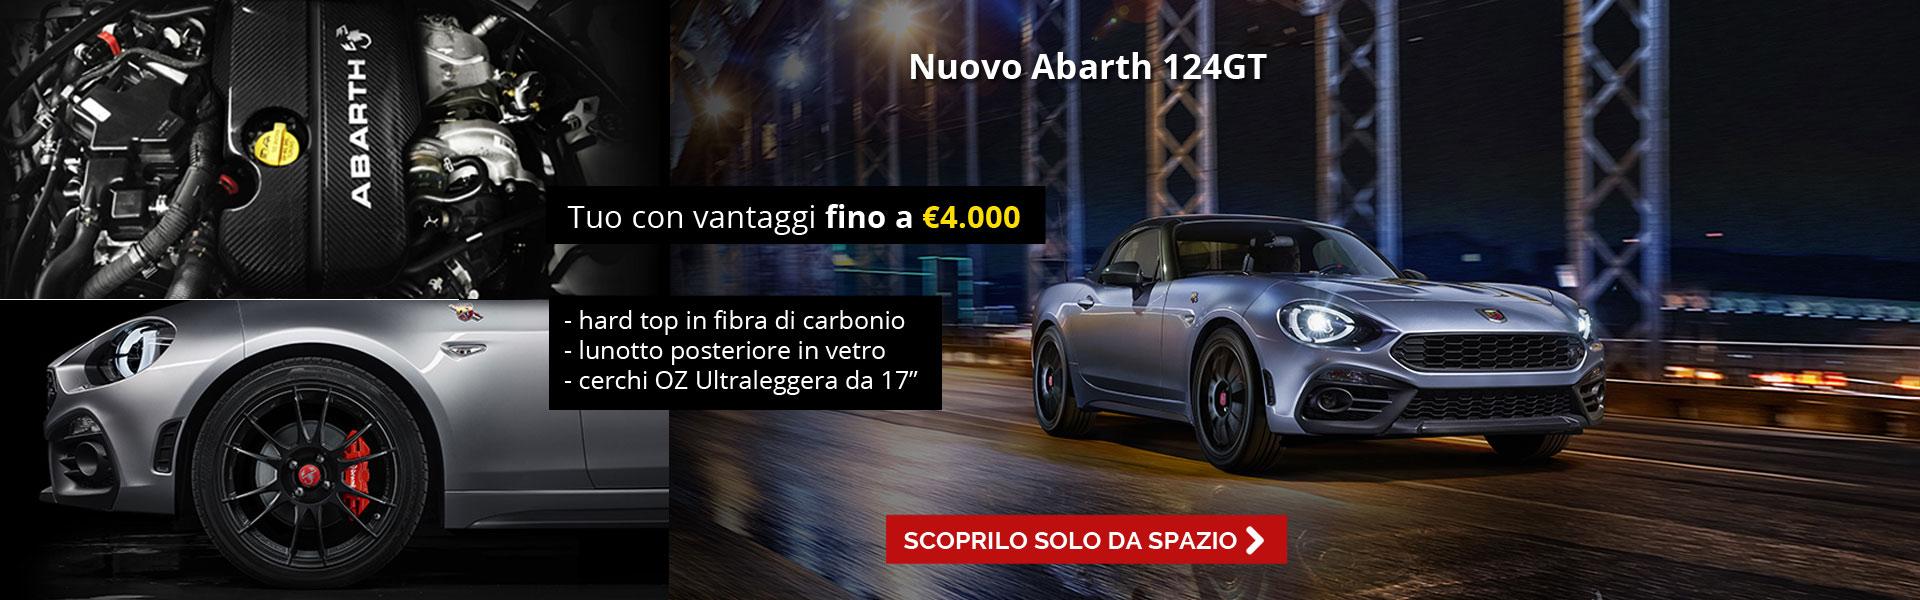 Abarth 124 GT